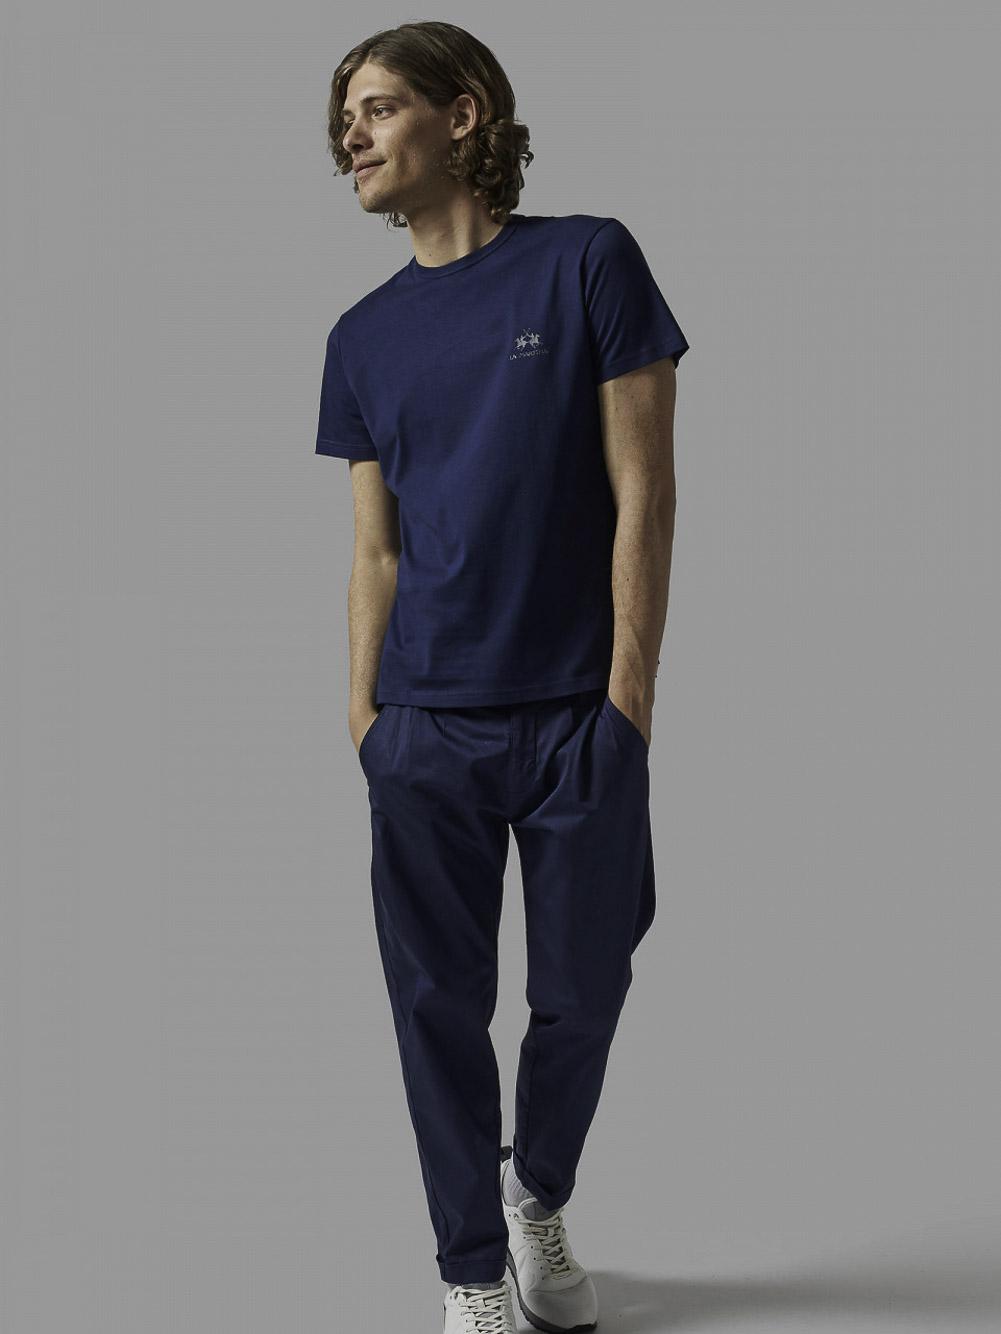 LA MARTINA Μπλούζα t-shirt 3LMCCMR02-7017 ΜΠΛΕ